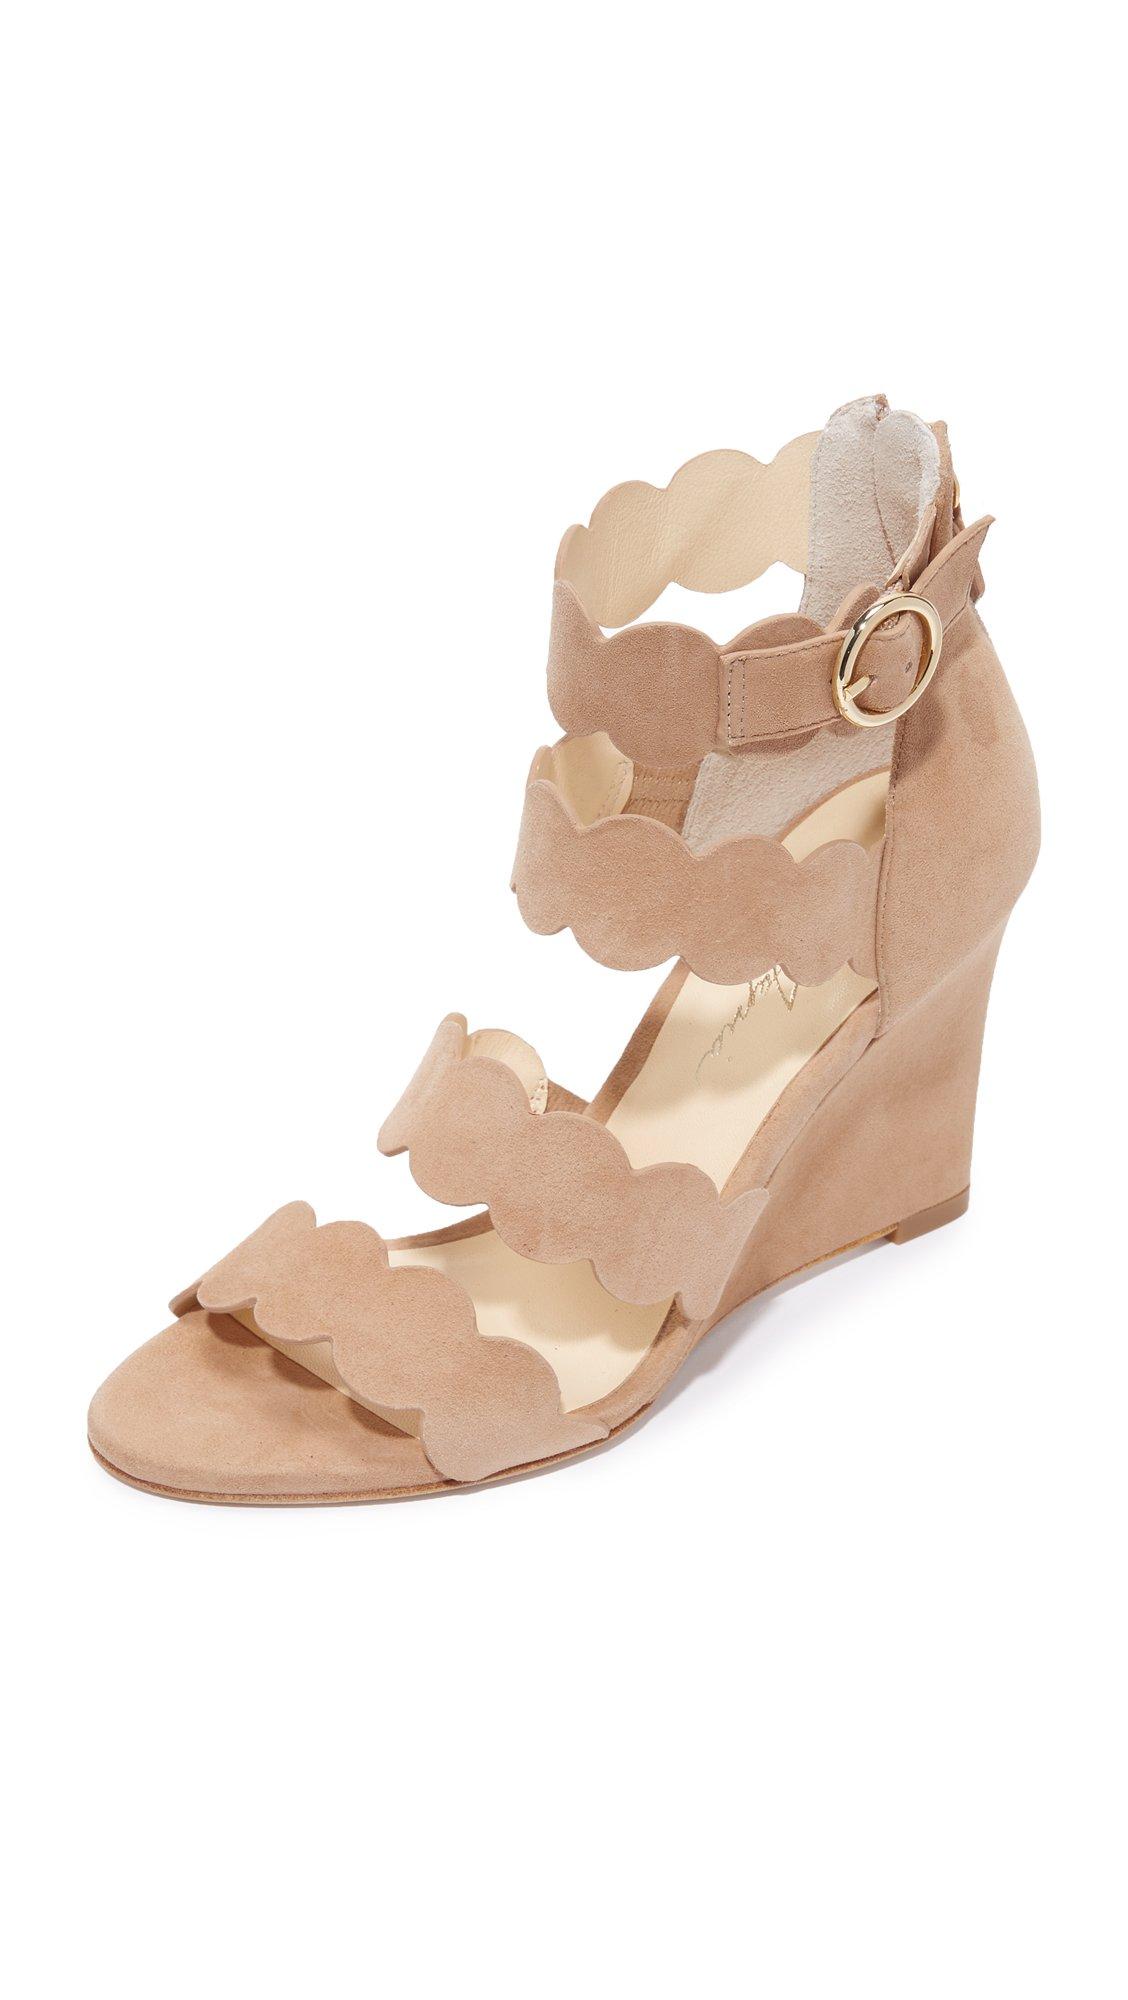 Isa Tapia Women's Paloma Wedge Sandals, Summer Sand, 37 EU (7 B(M) US Women)